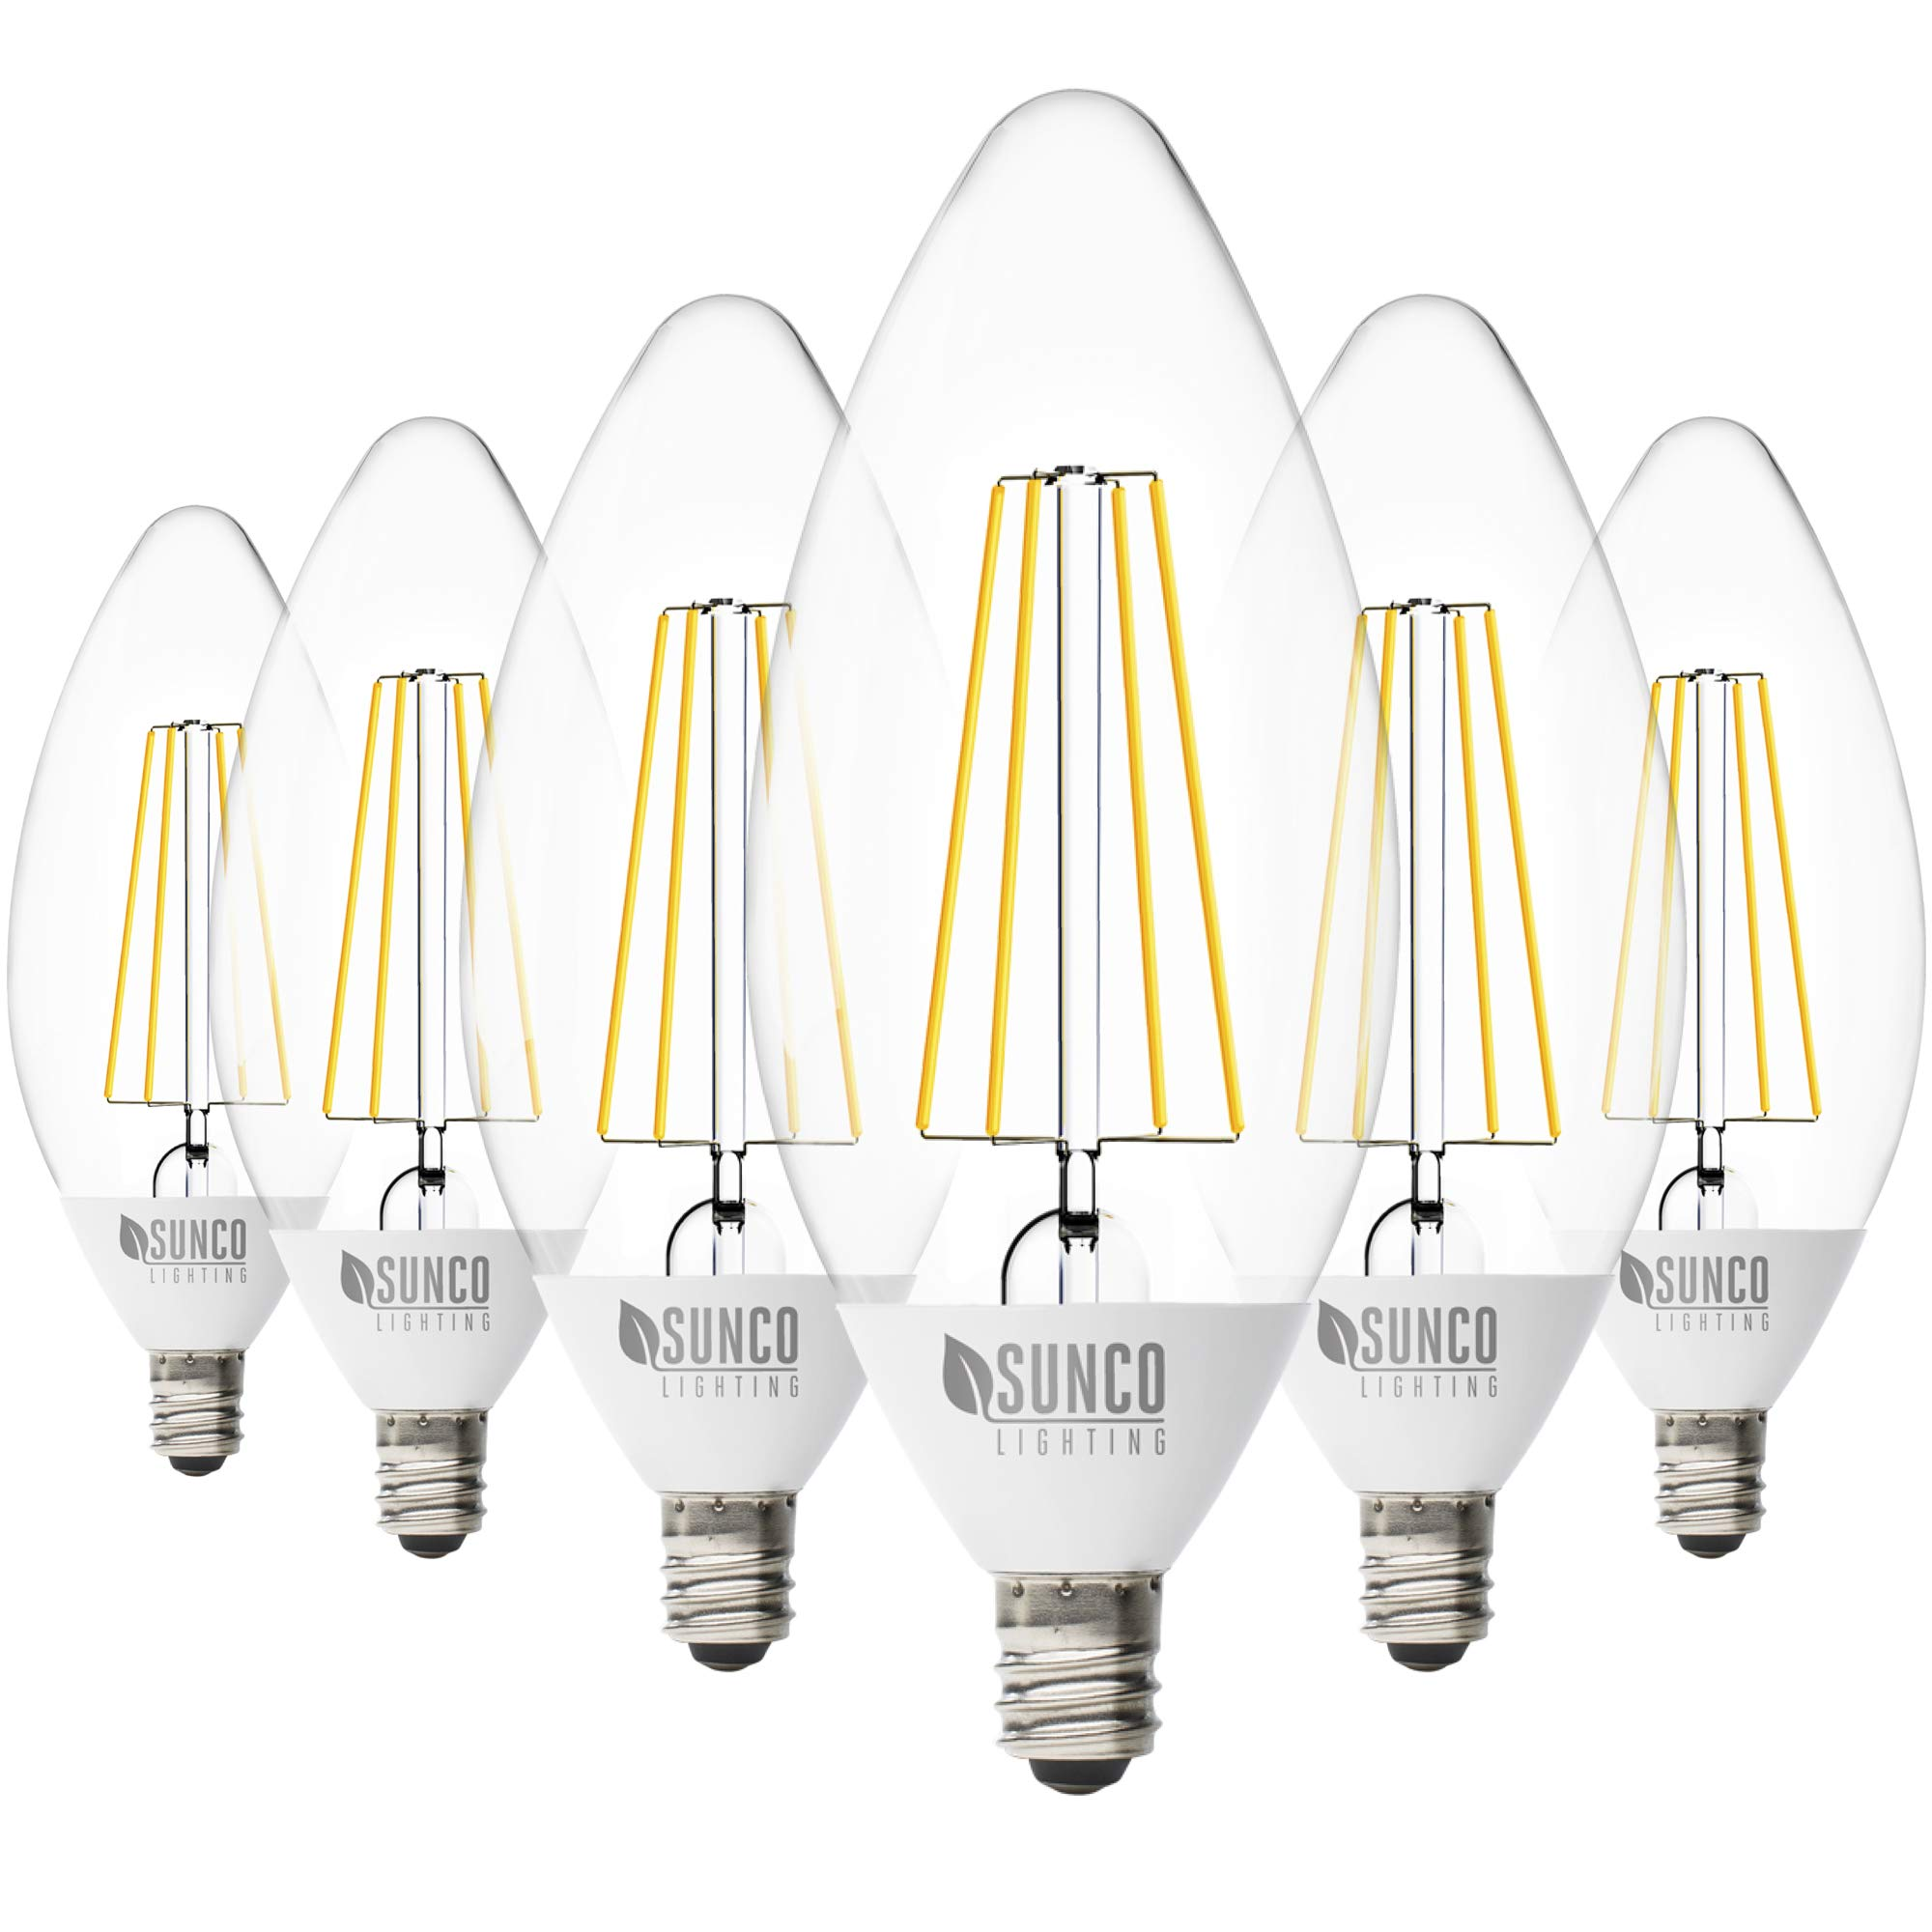 Sunco Lighting 6 Pack B11 LED Candelabra Bulb, Dusk-to-Dawn, 5W=40W, 5000K Daylight, Filament, 500 LM, E12 Base, Outdoor Decorative Light for Sconces - UL